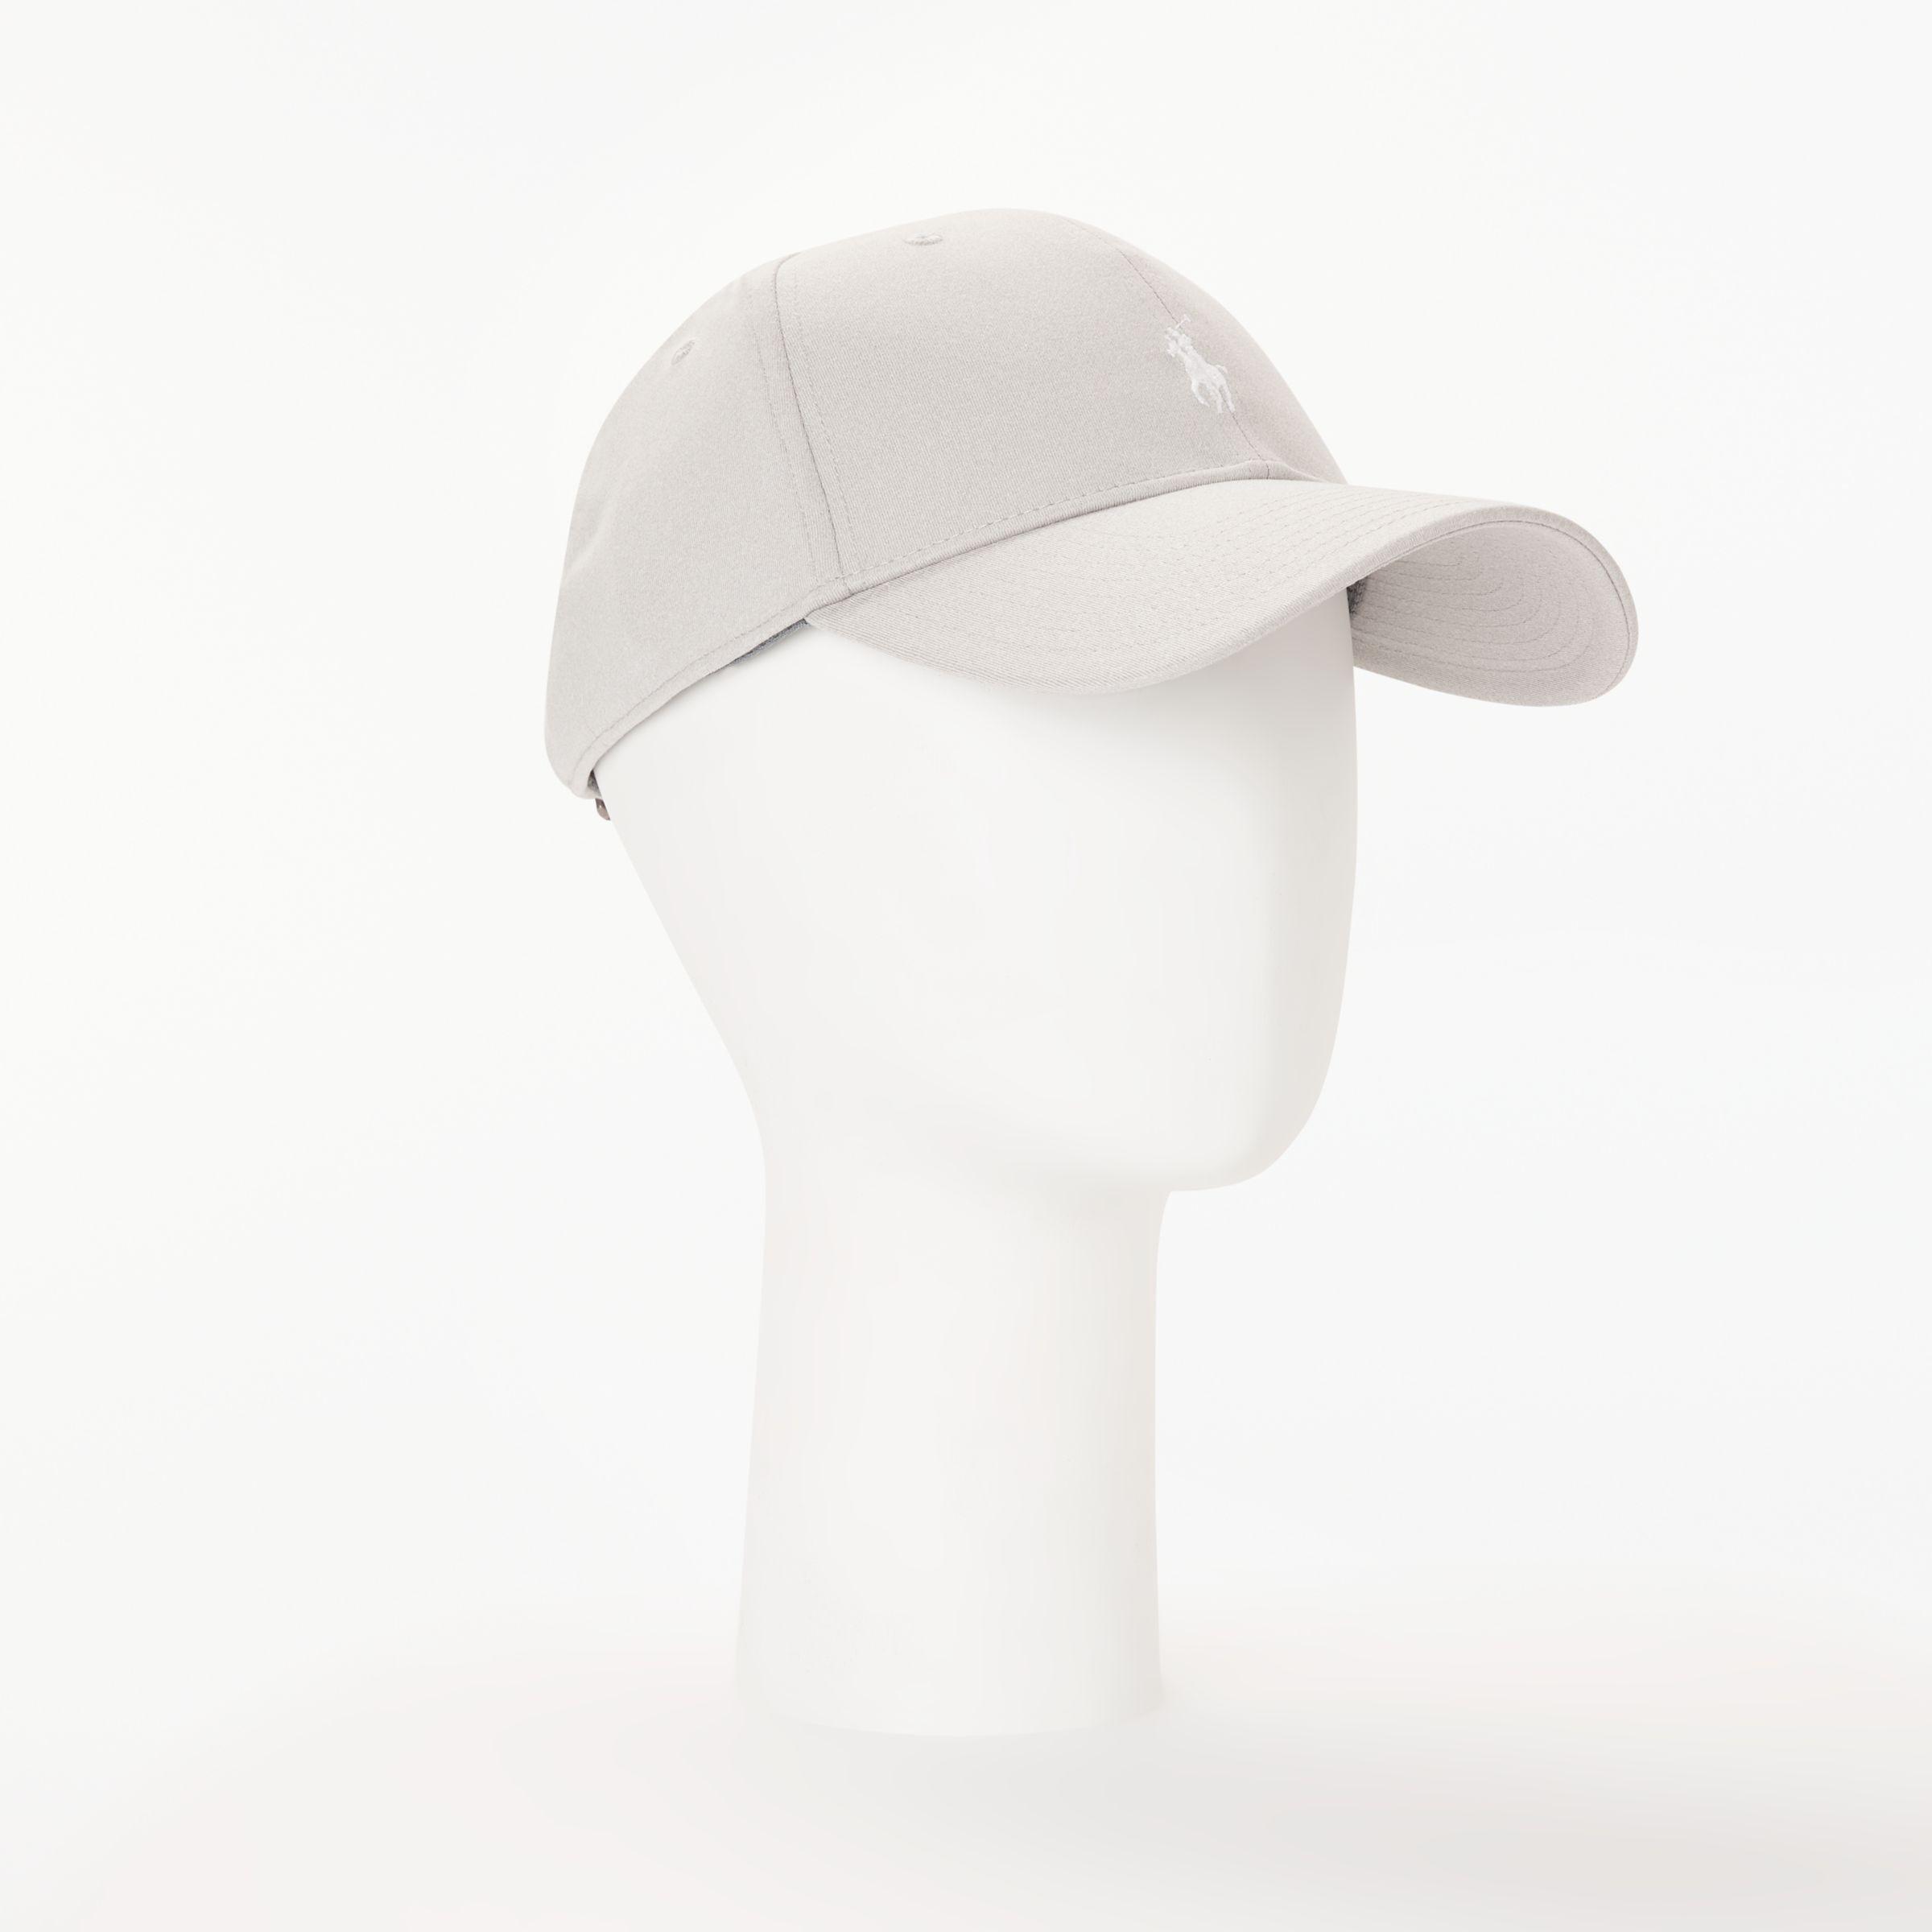 9ba7a3c490f Ralph Lauren Polo Golf By Fairway Cap in White for Men - Lyst